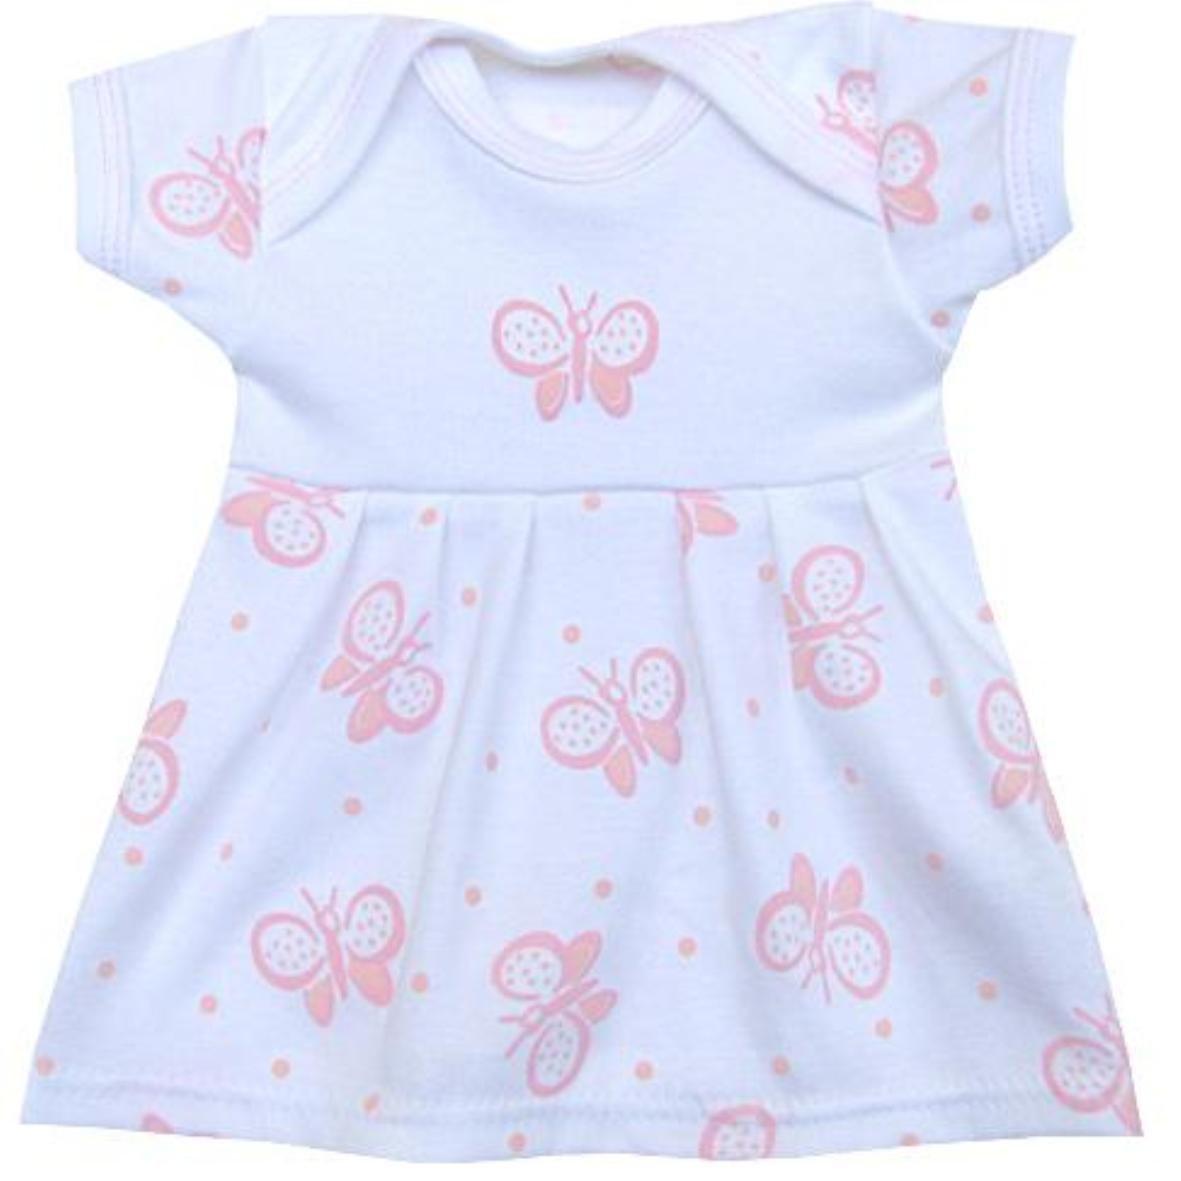 BabyPrem Babywäsche rosa Kleid Frühchen Neugeborene Kleidung 32-50cm